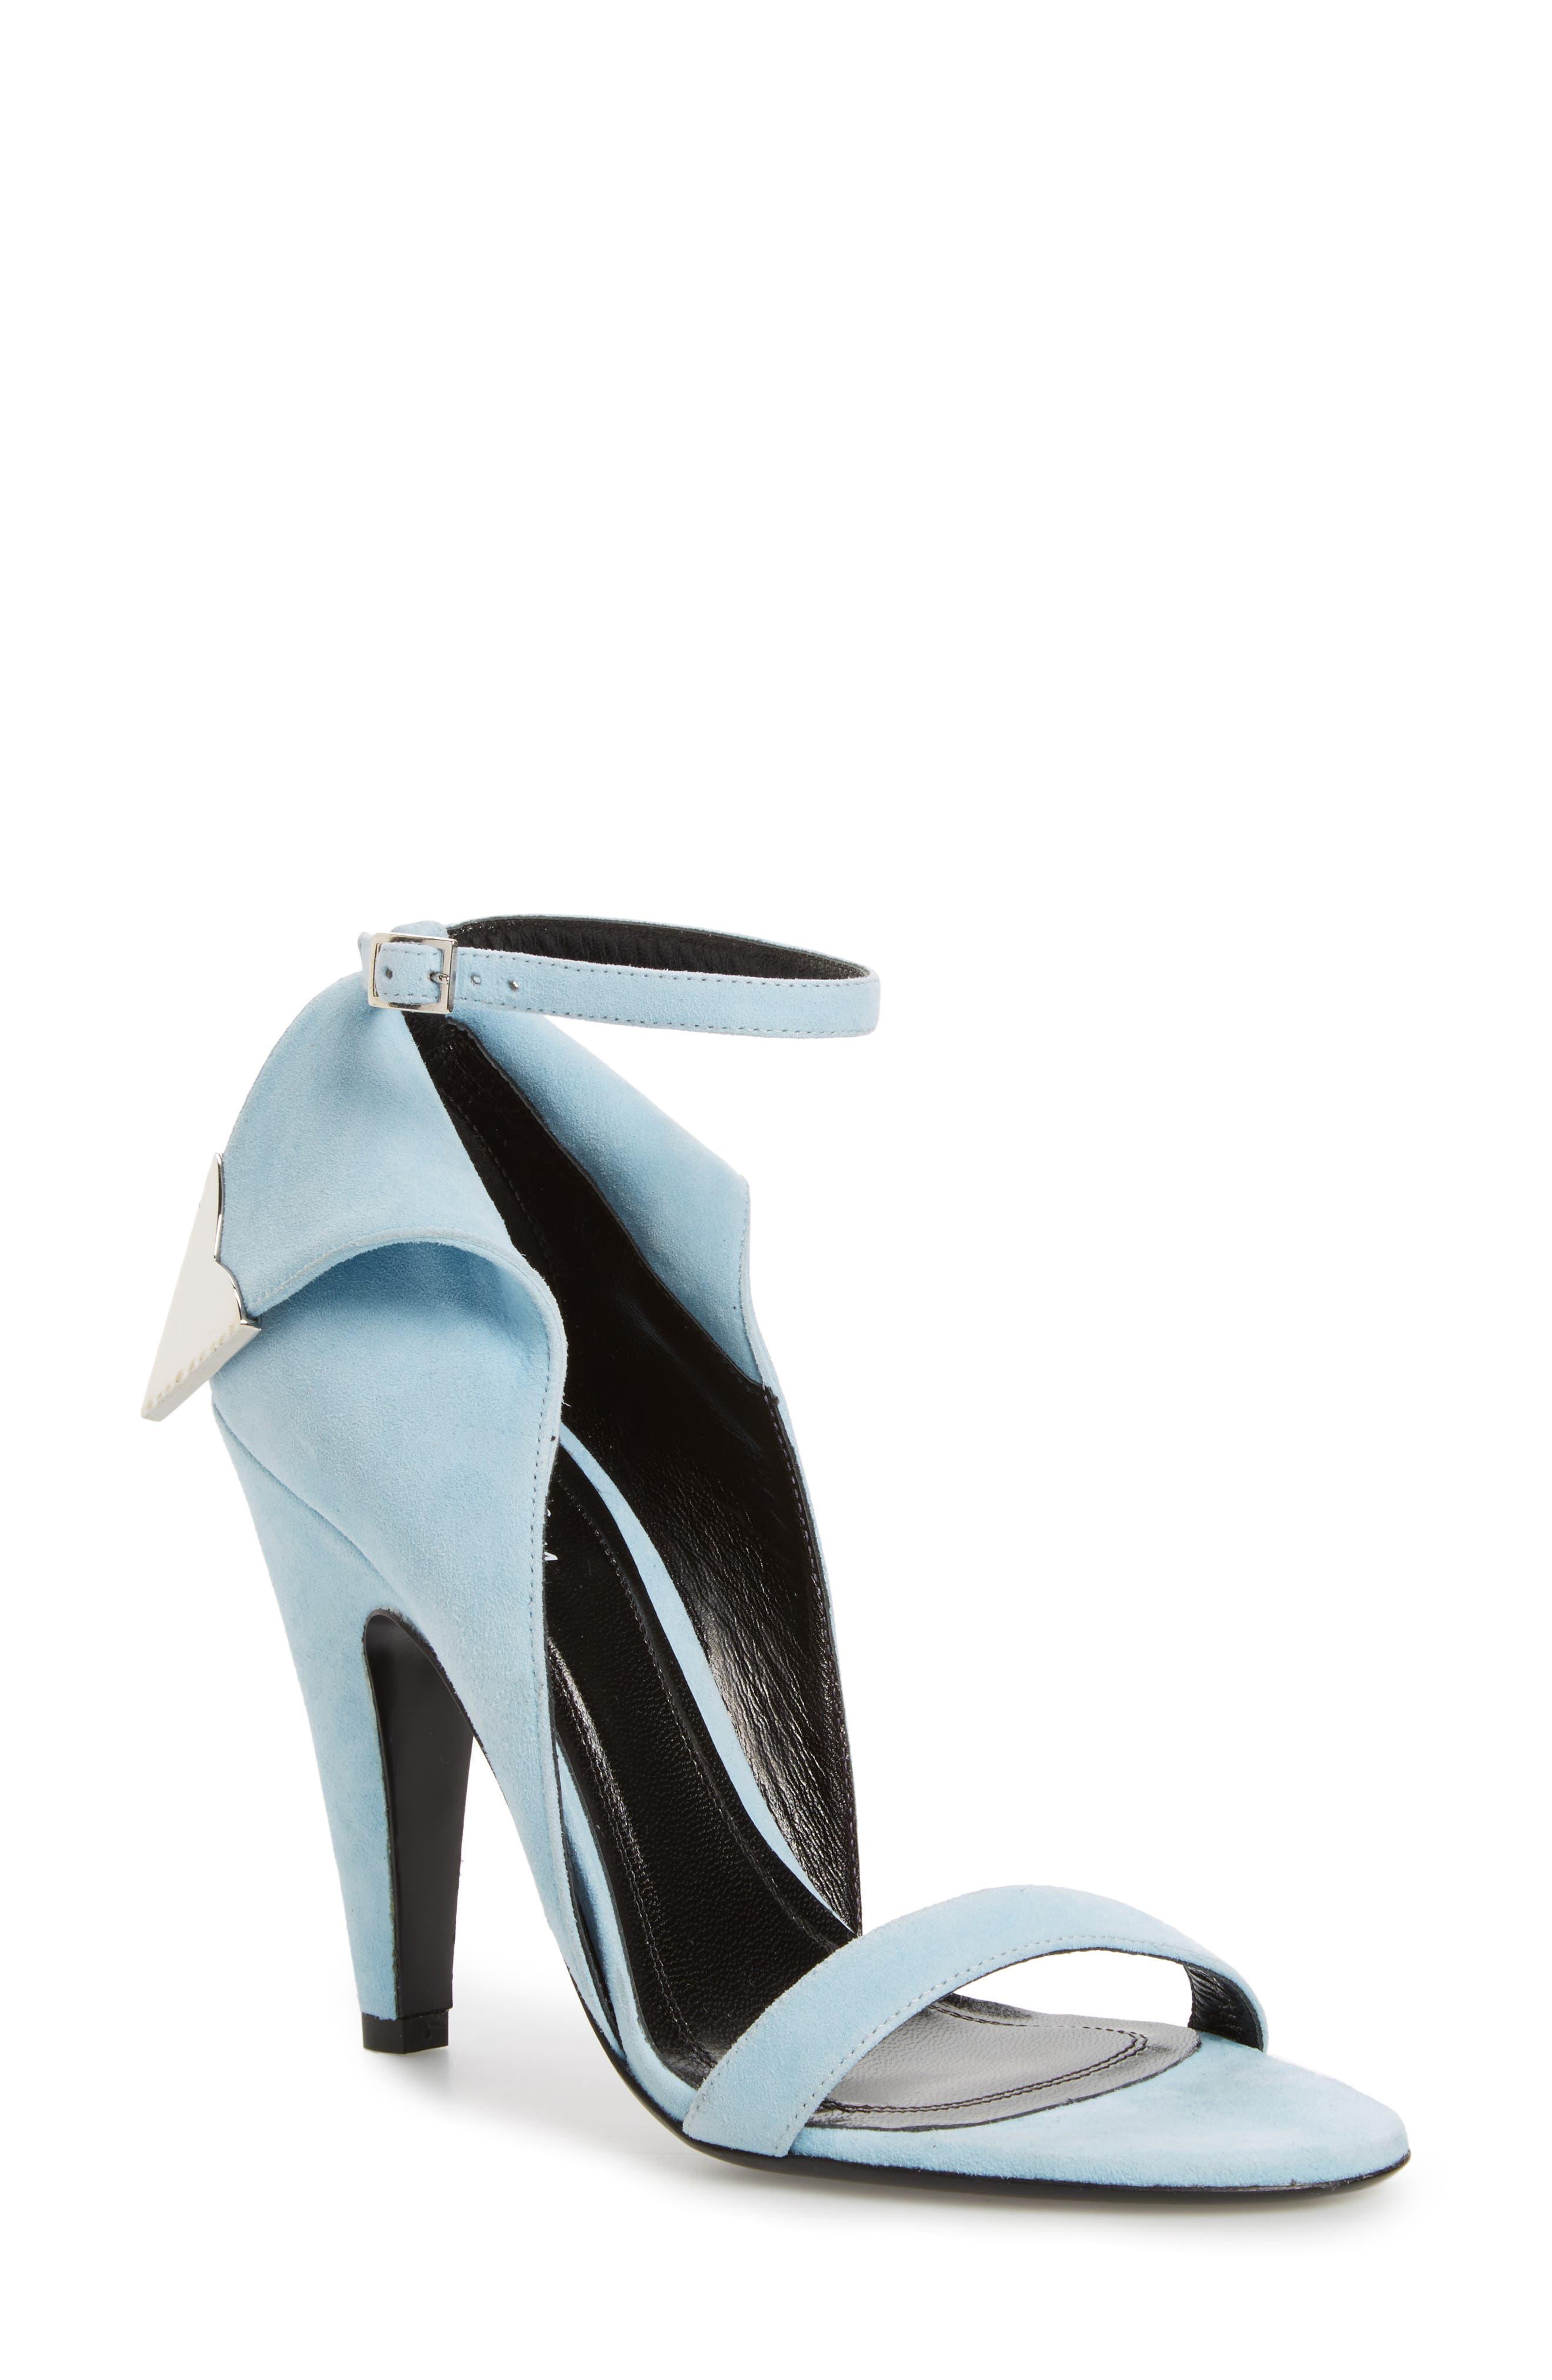 Leititia Ankle Strap Sandal,                         Main,                         color, 400